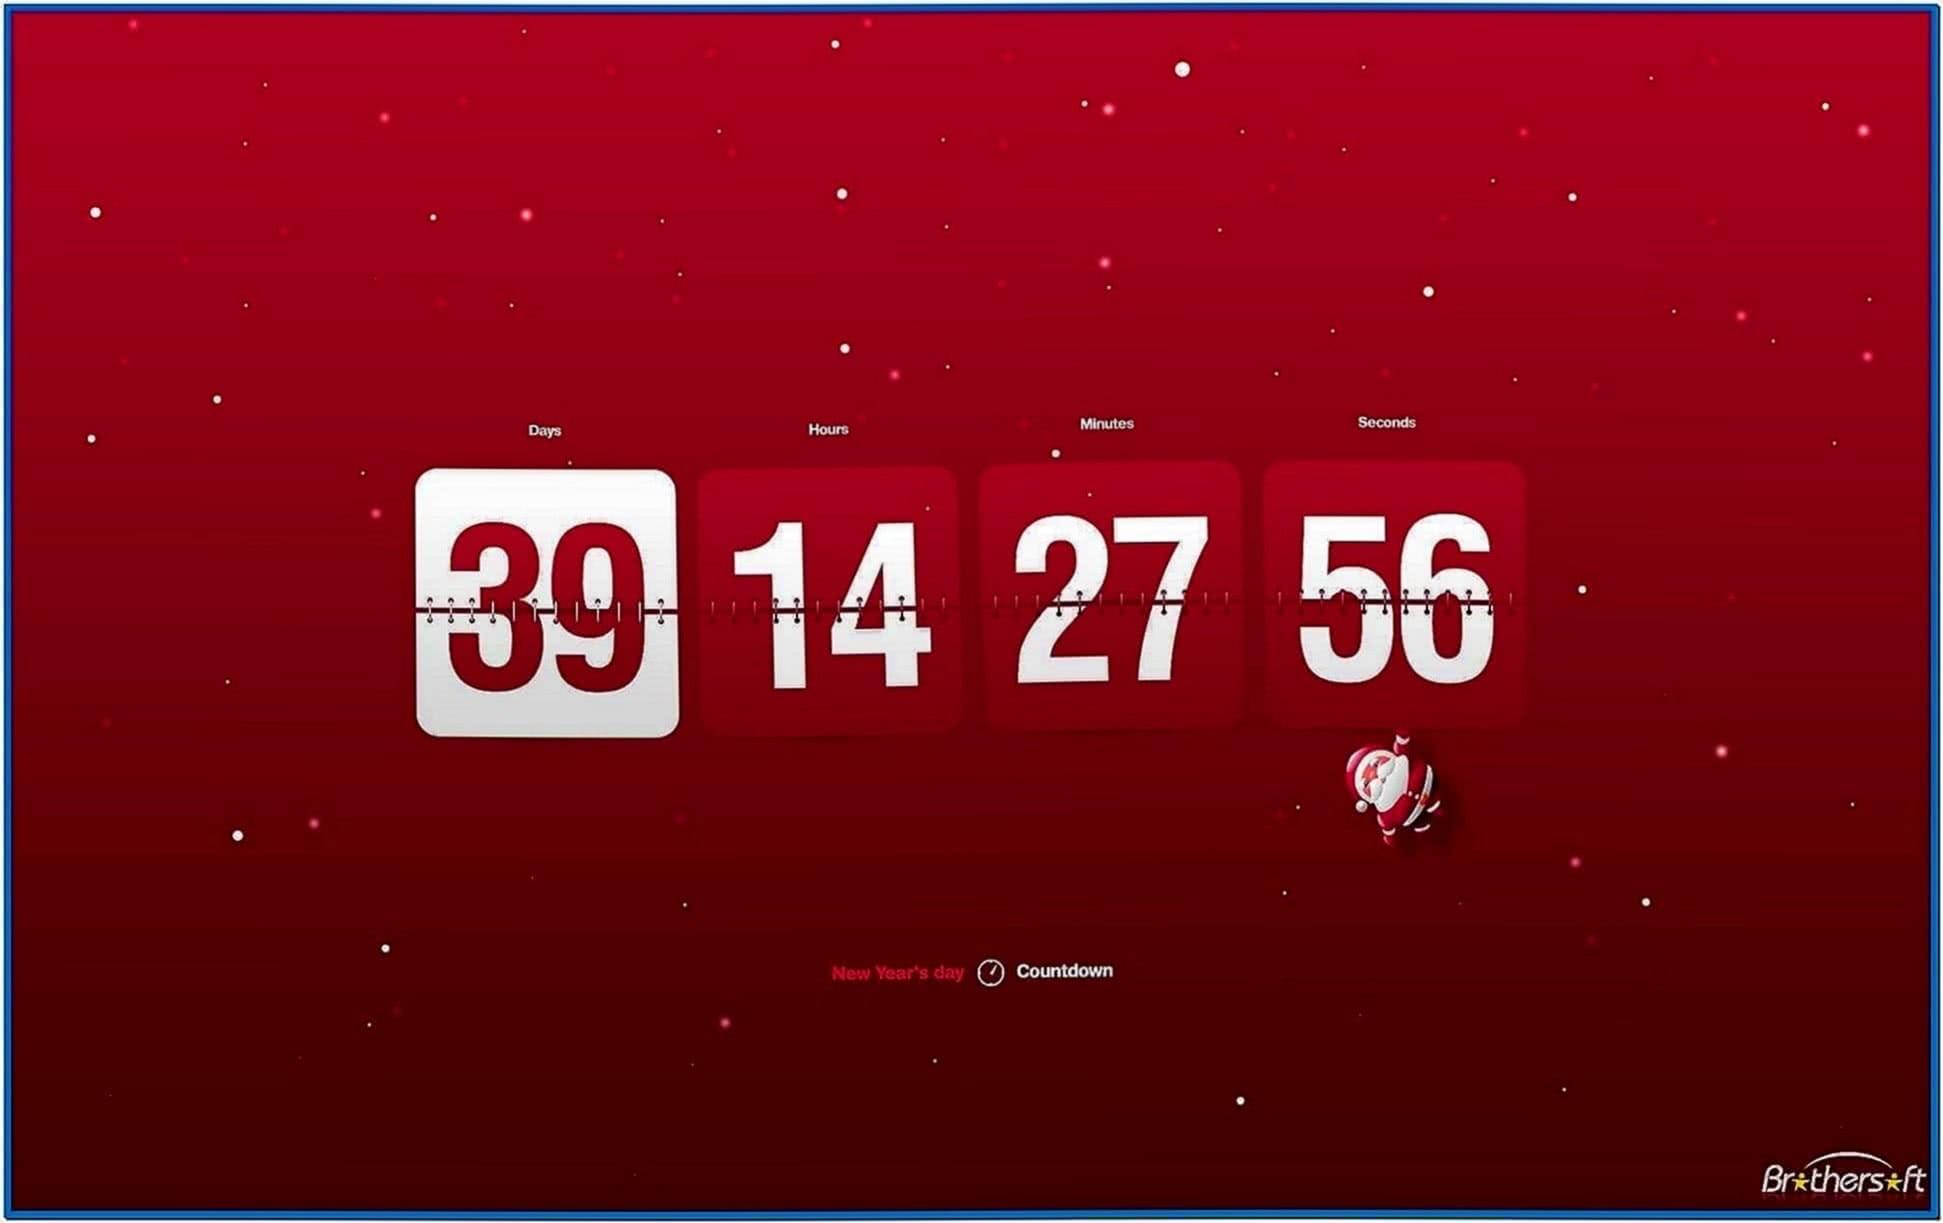 Christmas countdown clock screensaver - Download free